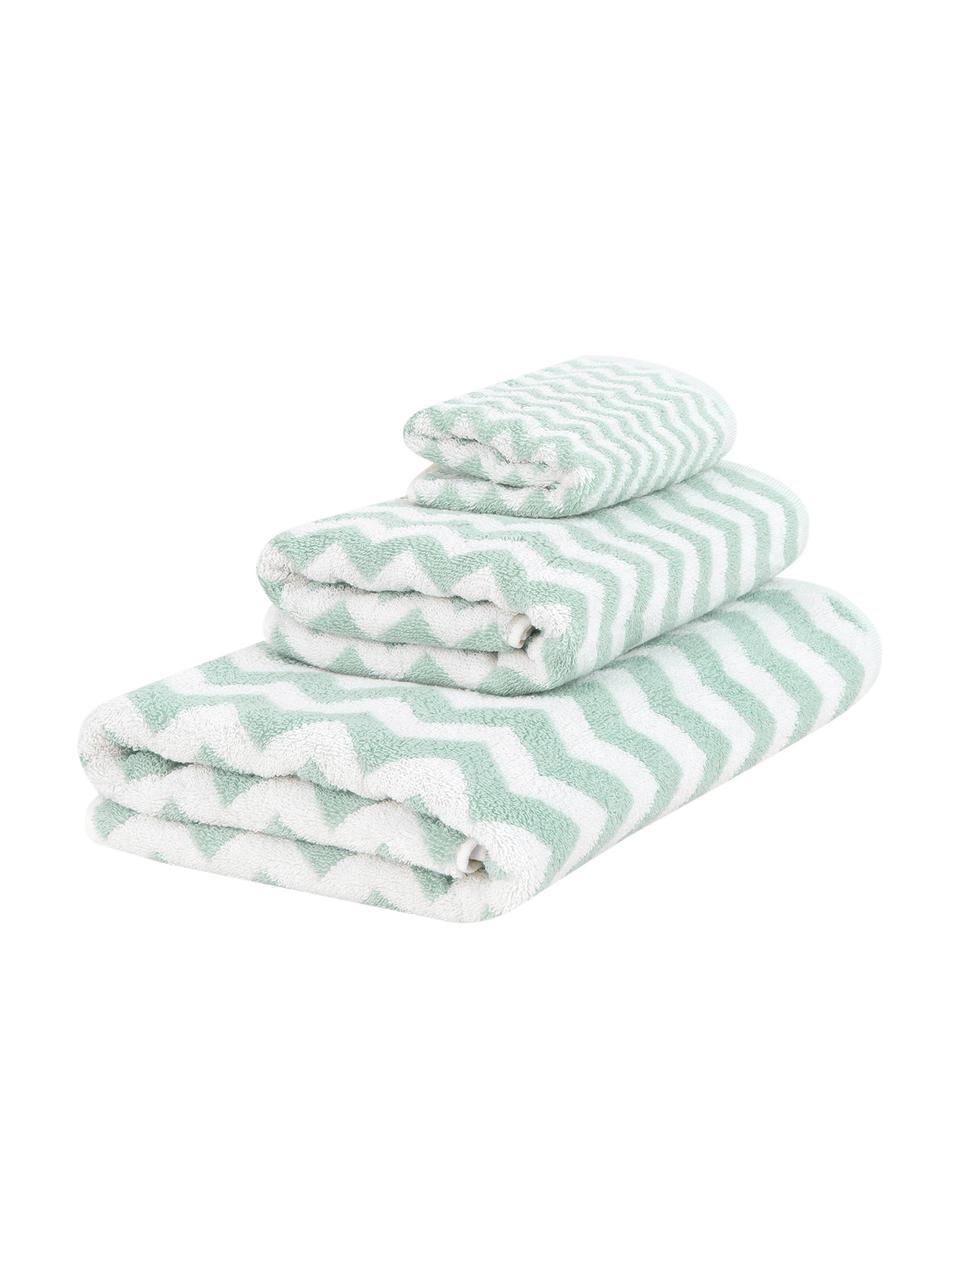 Set 3 asciugamani con motivo a zigzag Liv, Verde menta, bianco crema, Set in varie misure